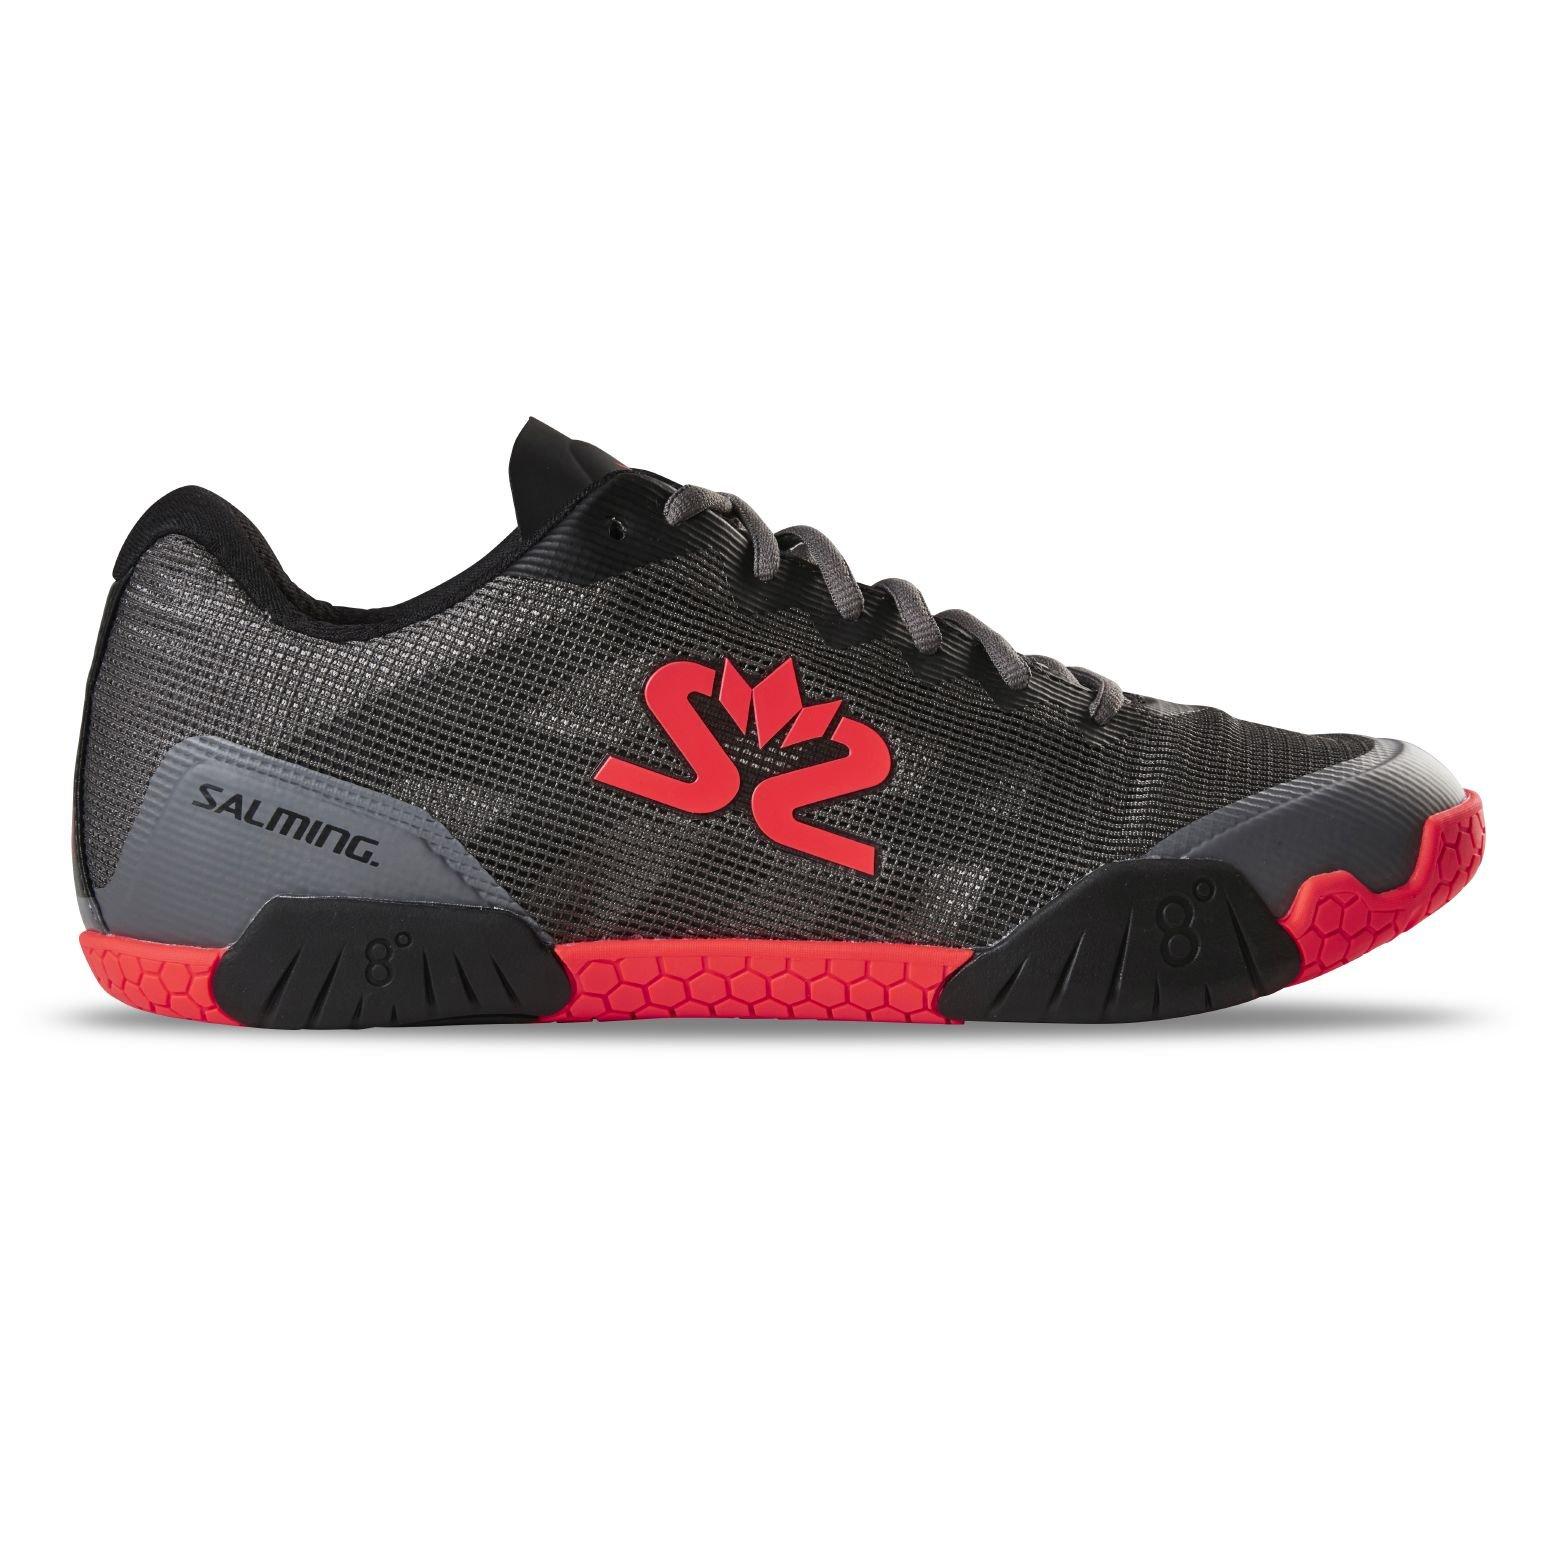 Salming Hawk Shoe Men GunMetal/Red 49 1/3